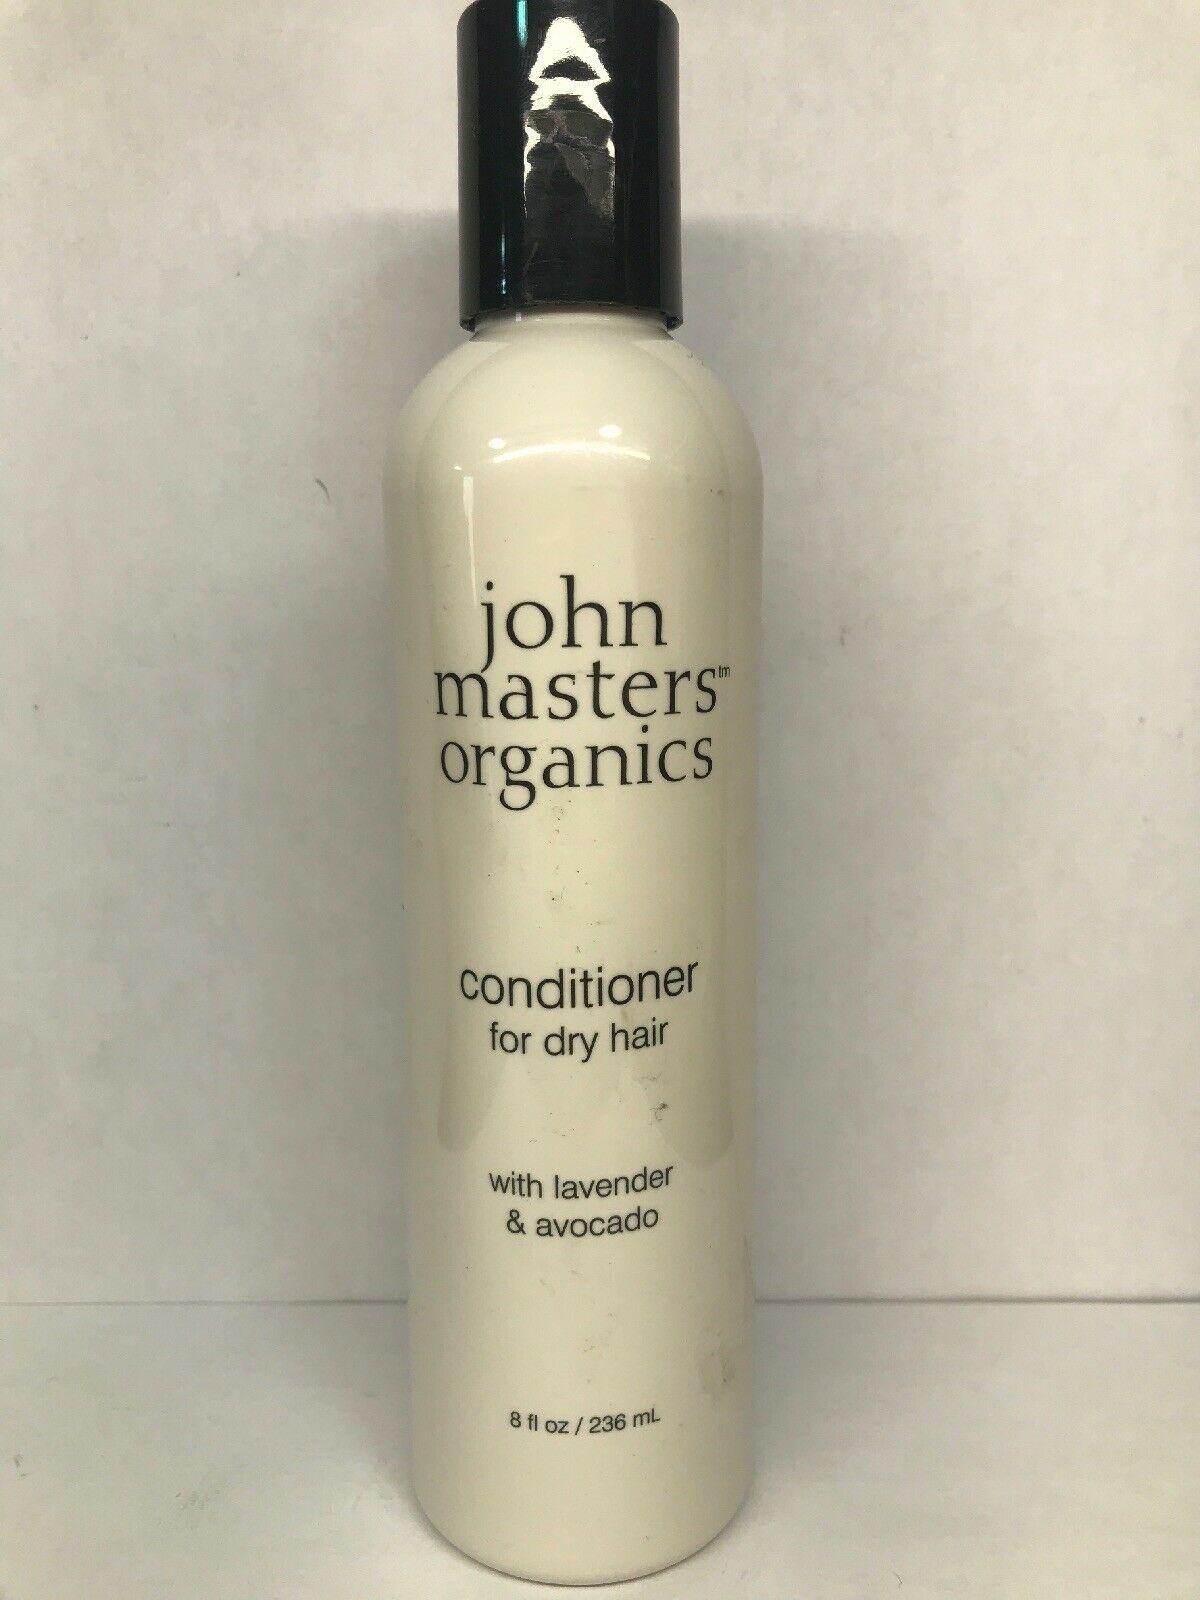 John Masters Organics Conditioner For Dry Hair 8 Ounce w/ Lavendar & Avocado